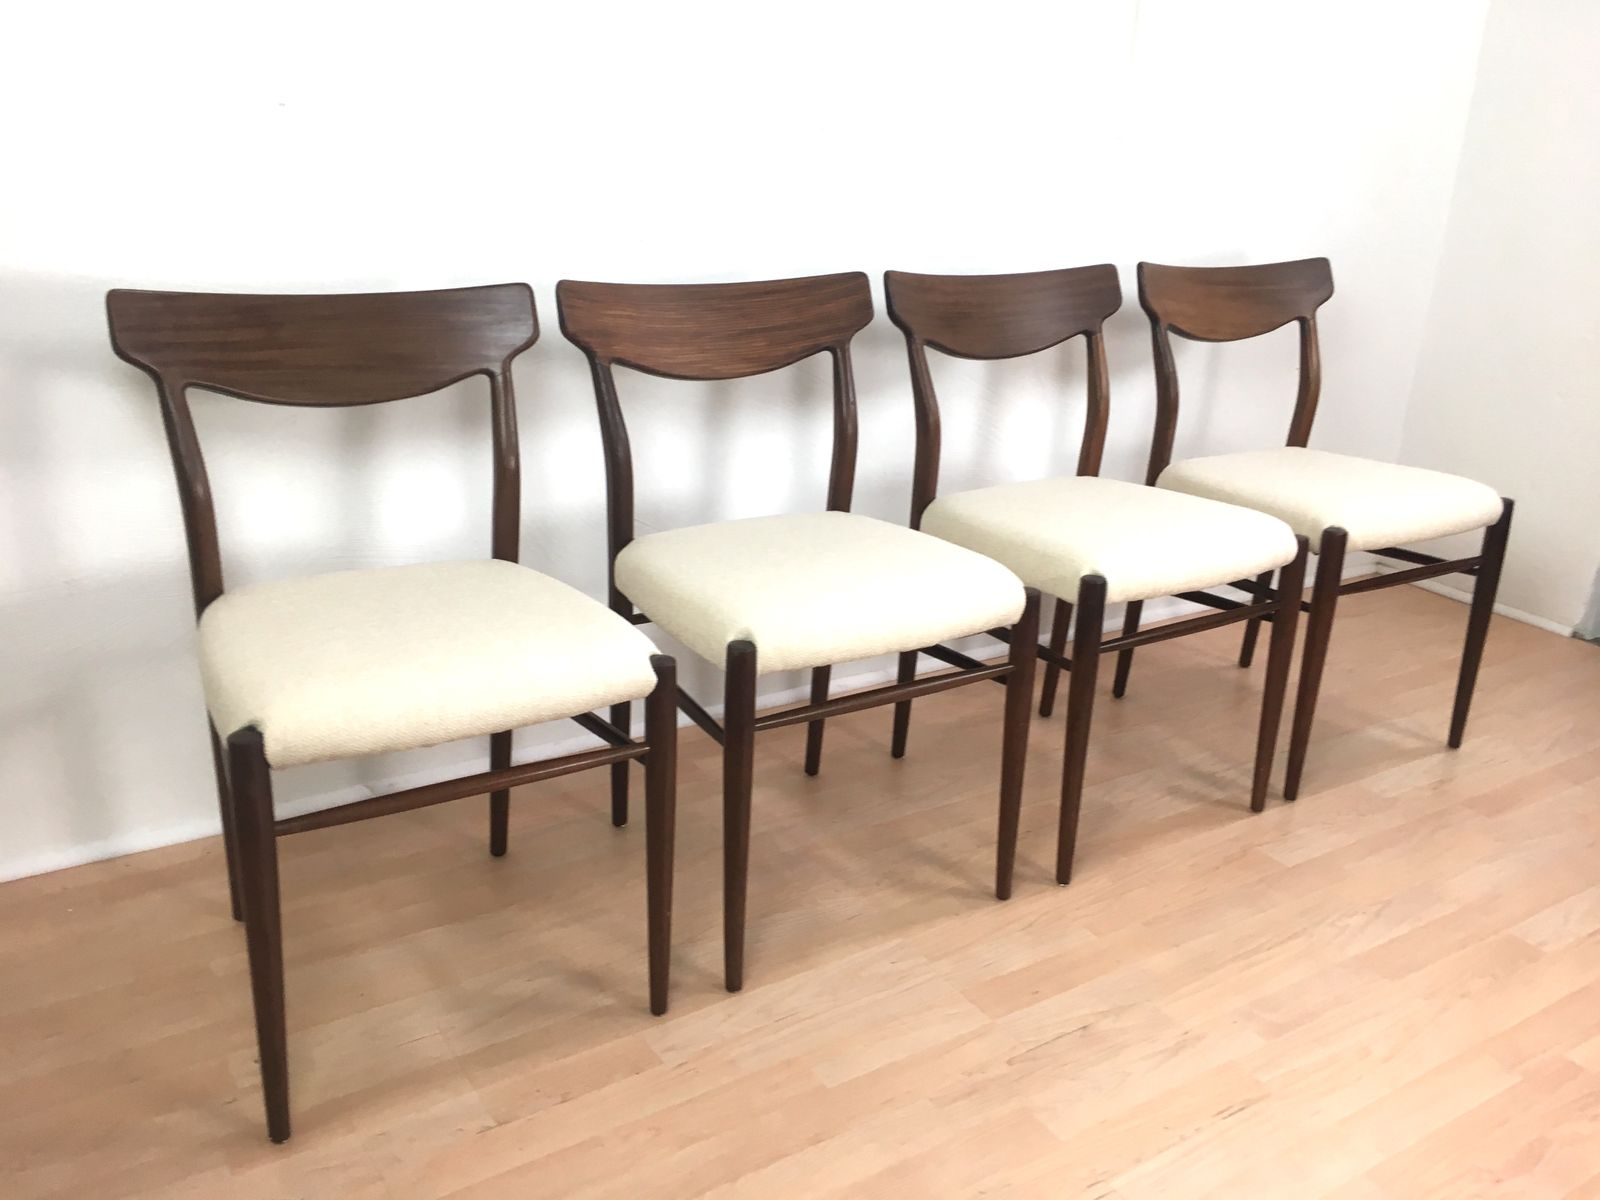 mid century st hle von l bke 4er set bei pamono kaufen. Black Bedroom Furniture Sets. Home Design Ideas